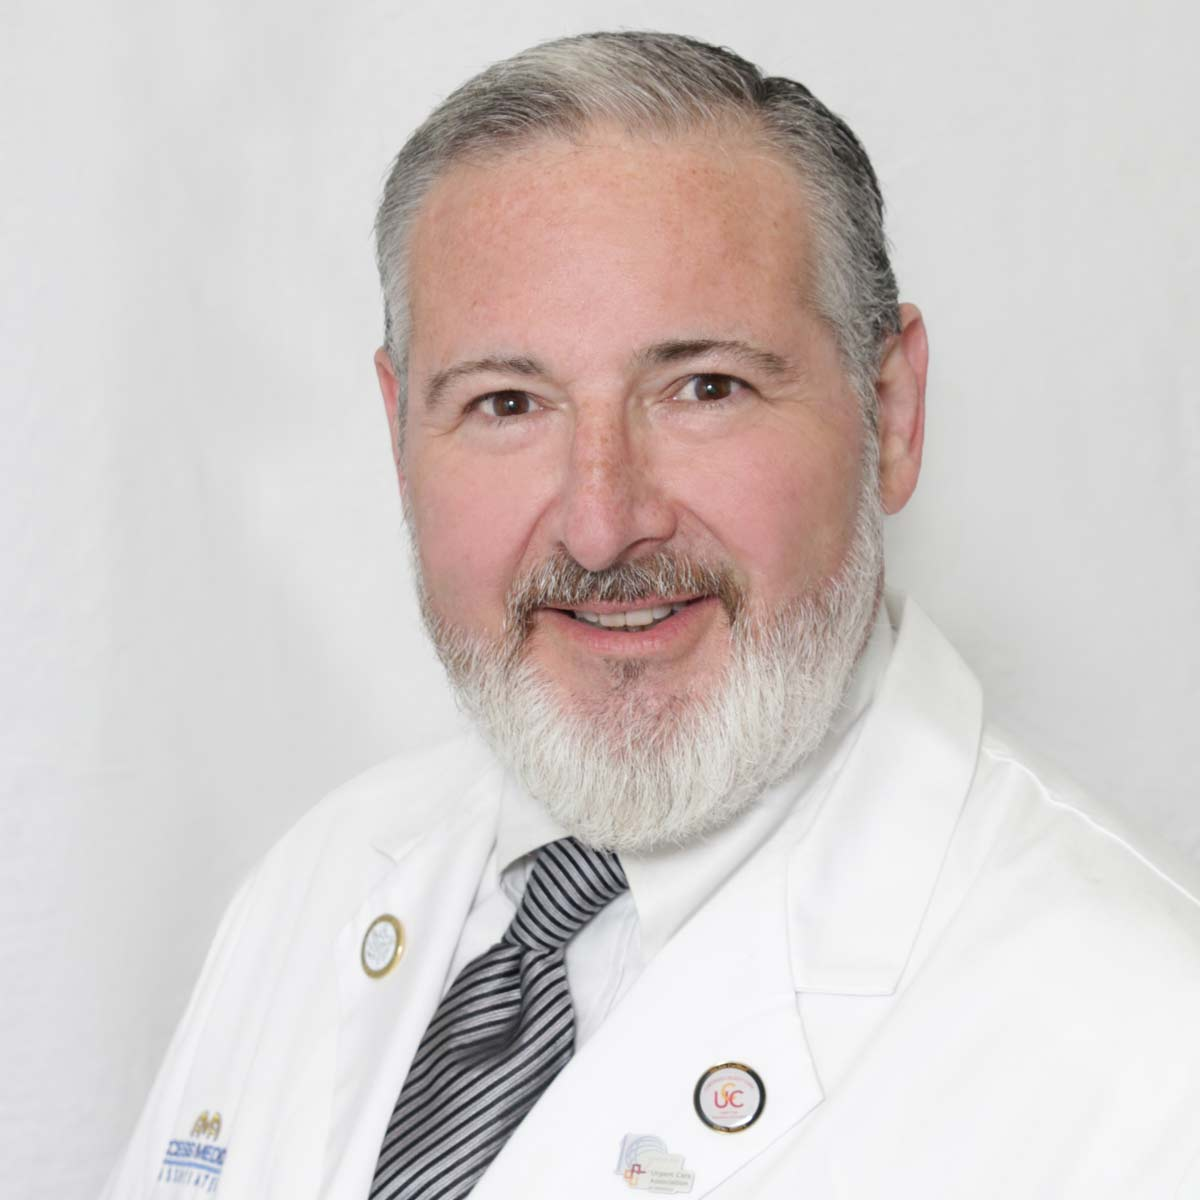 Dr. Lon Goldberg - Access Medical Associates Branchburg NJ